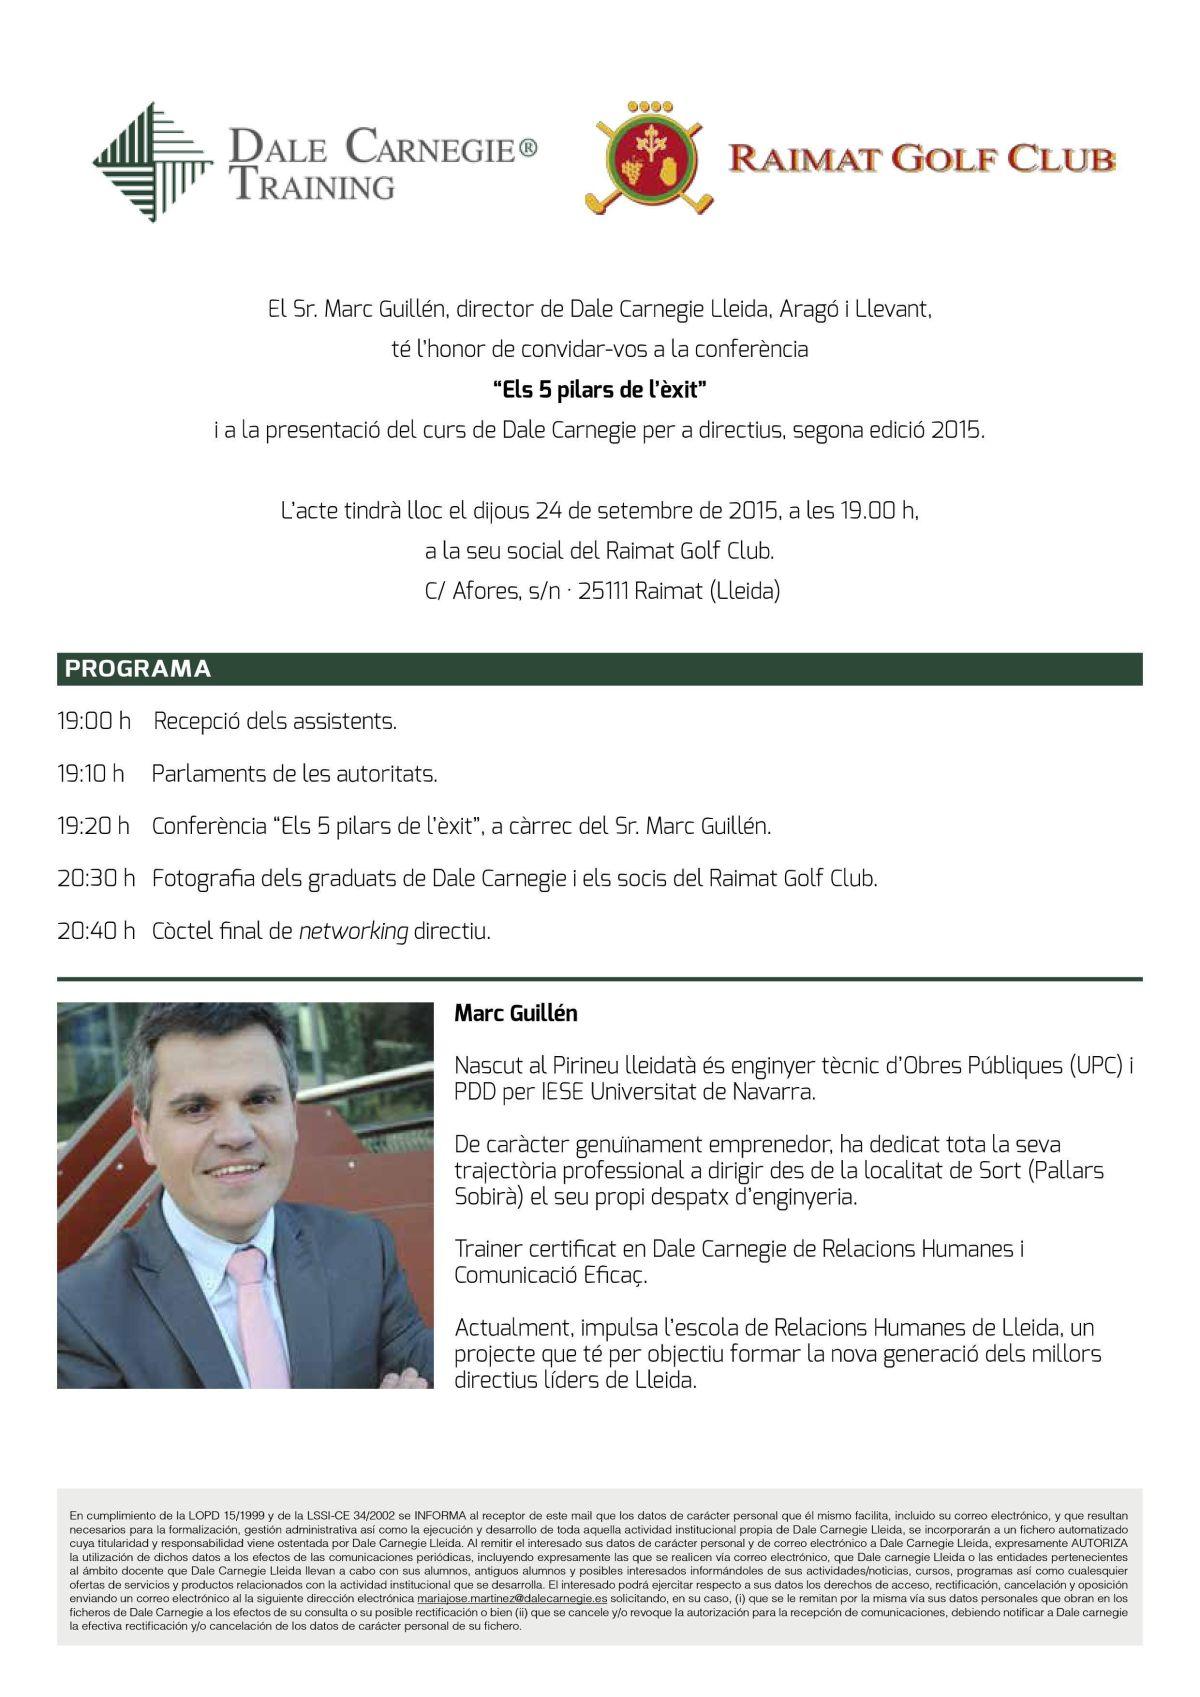 Invitacio_conferencia_Raimat_Golf_Club